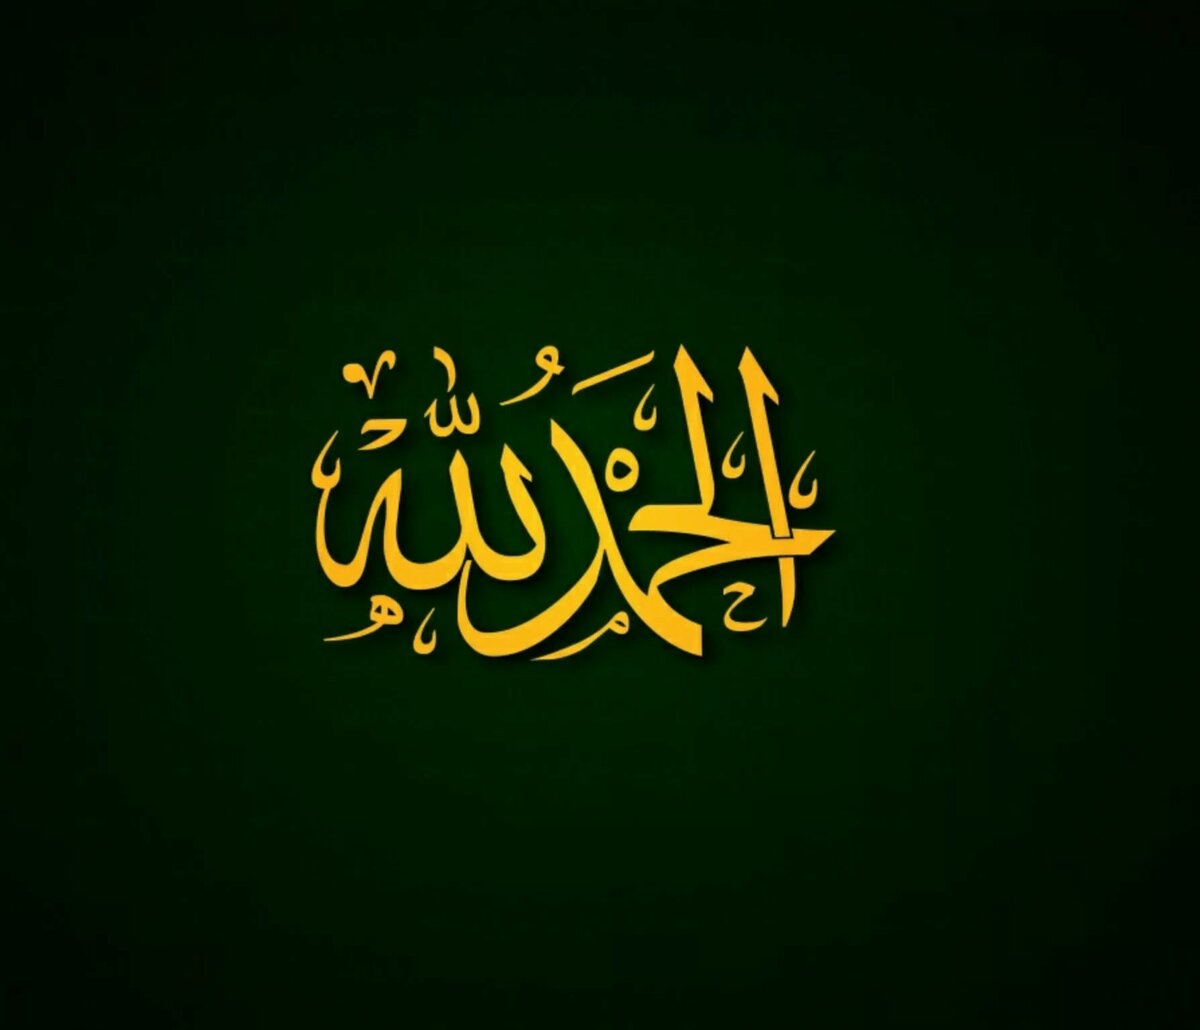 Исламский картинки с надписями арабскими, марта